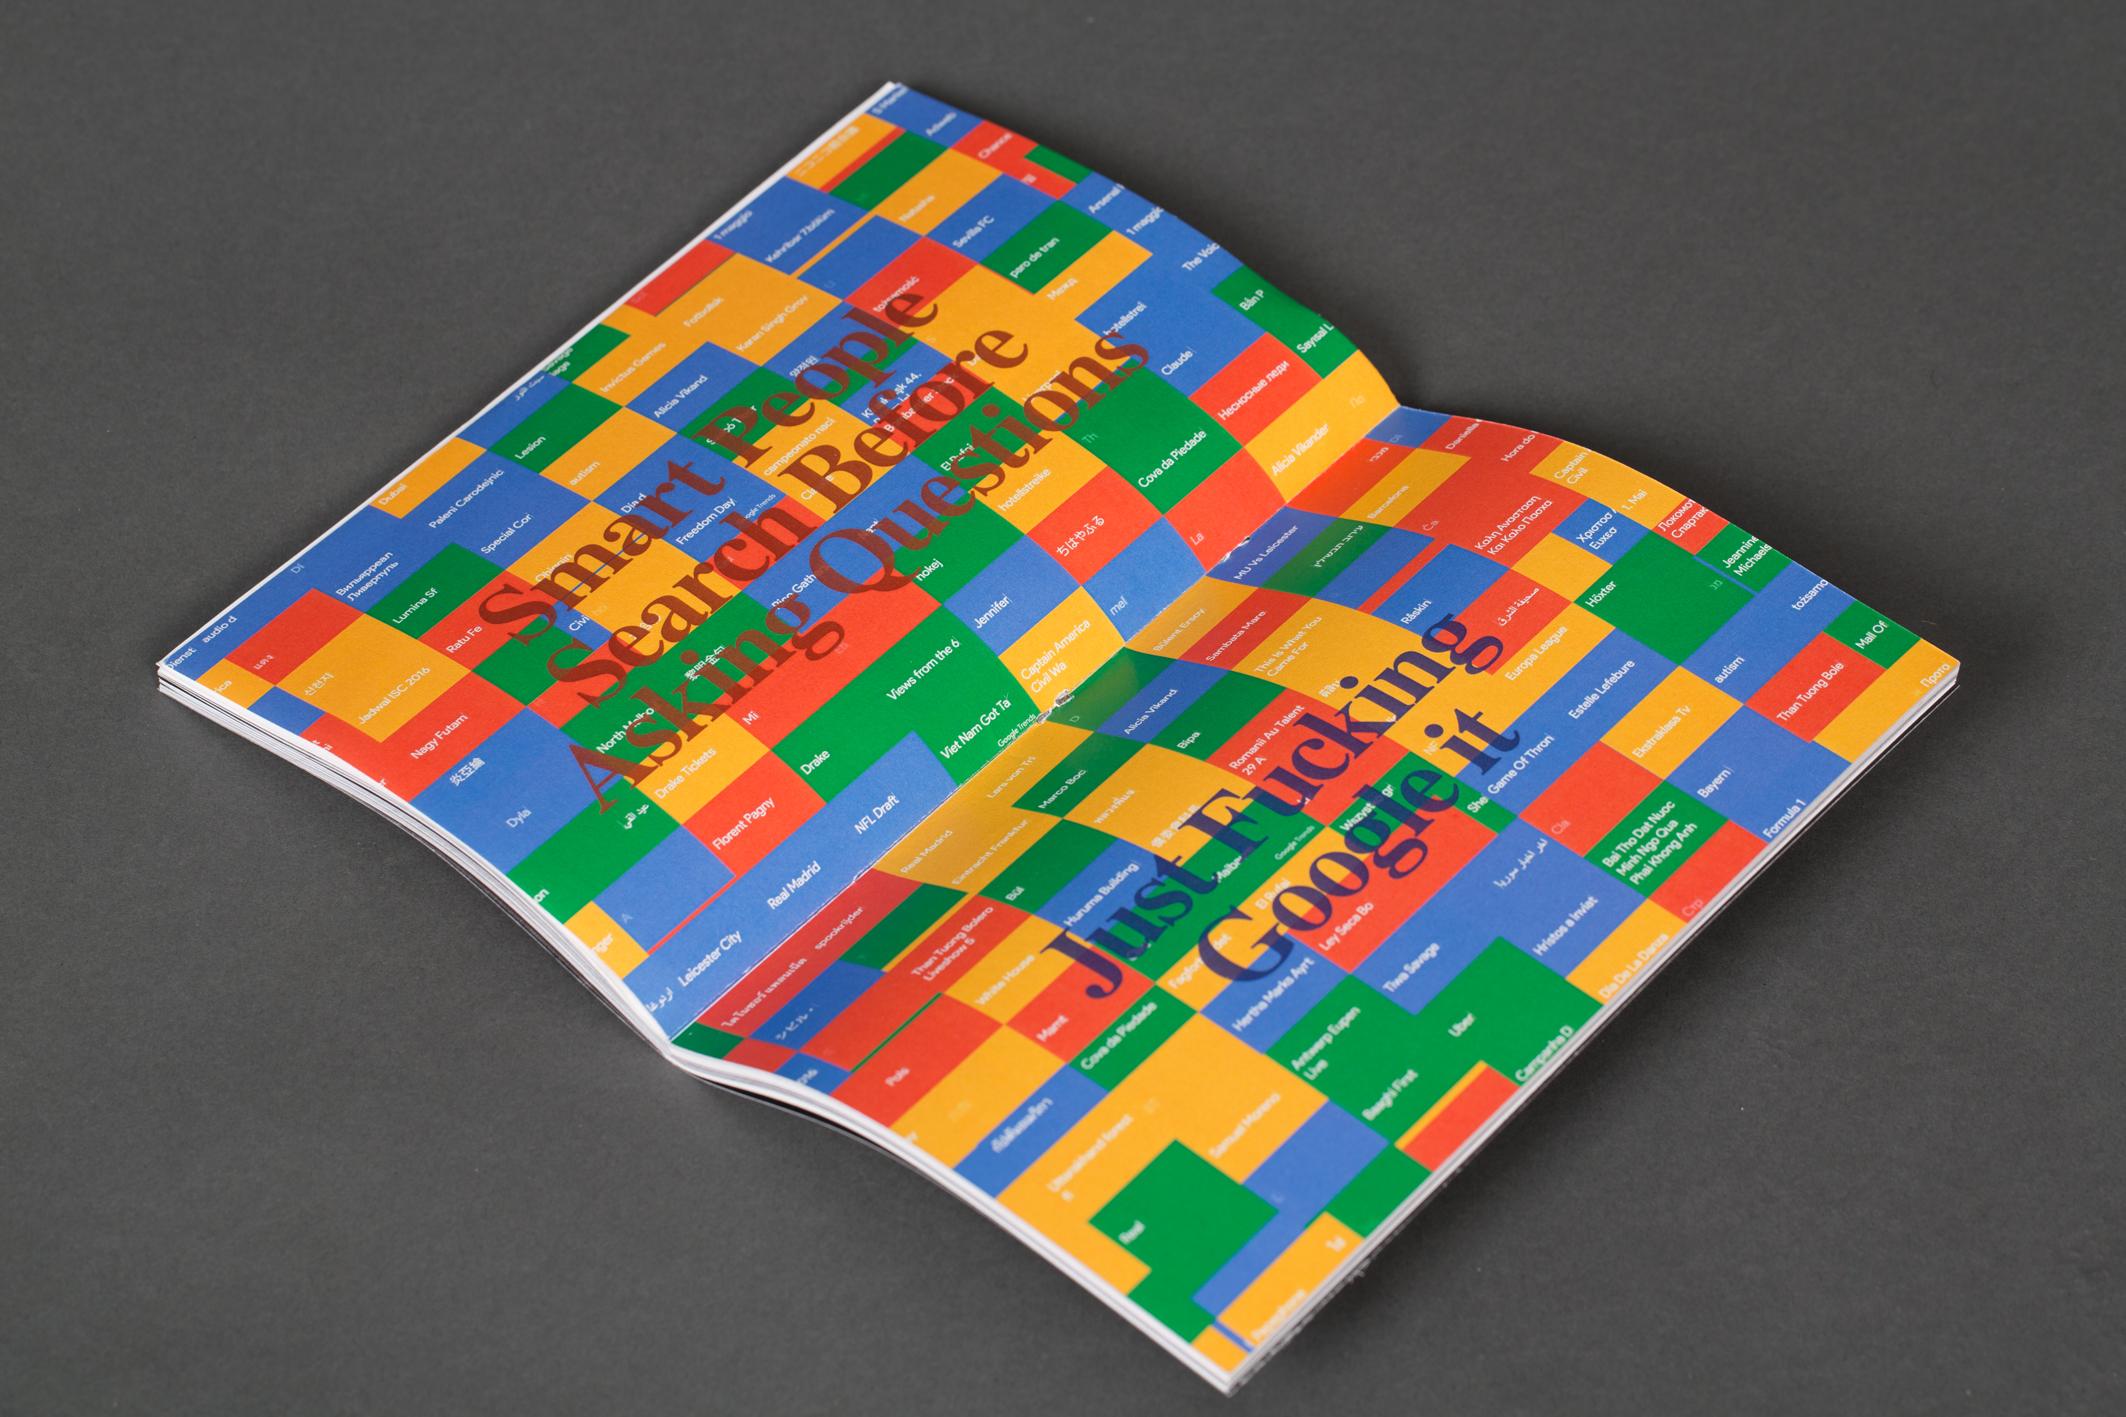 cyberbook17.jpg